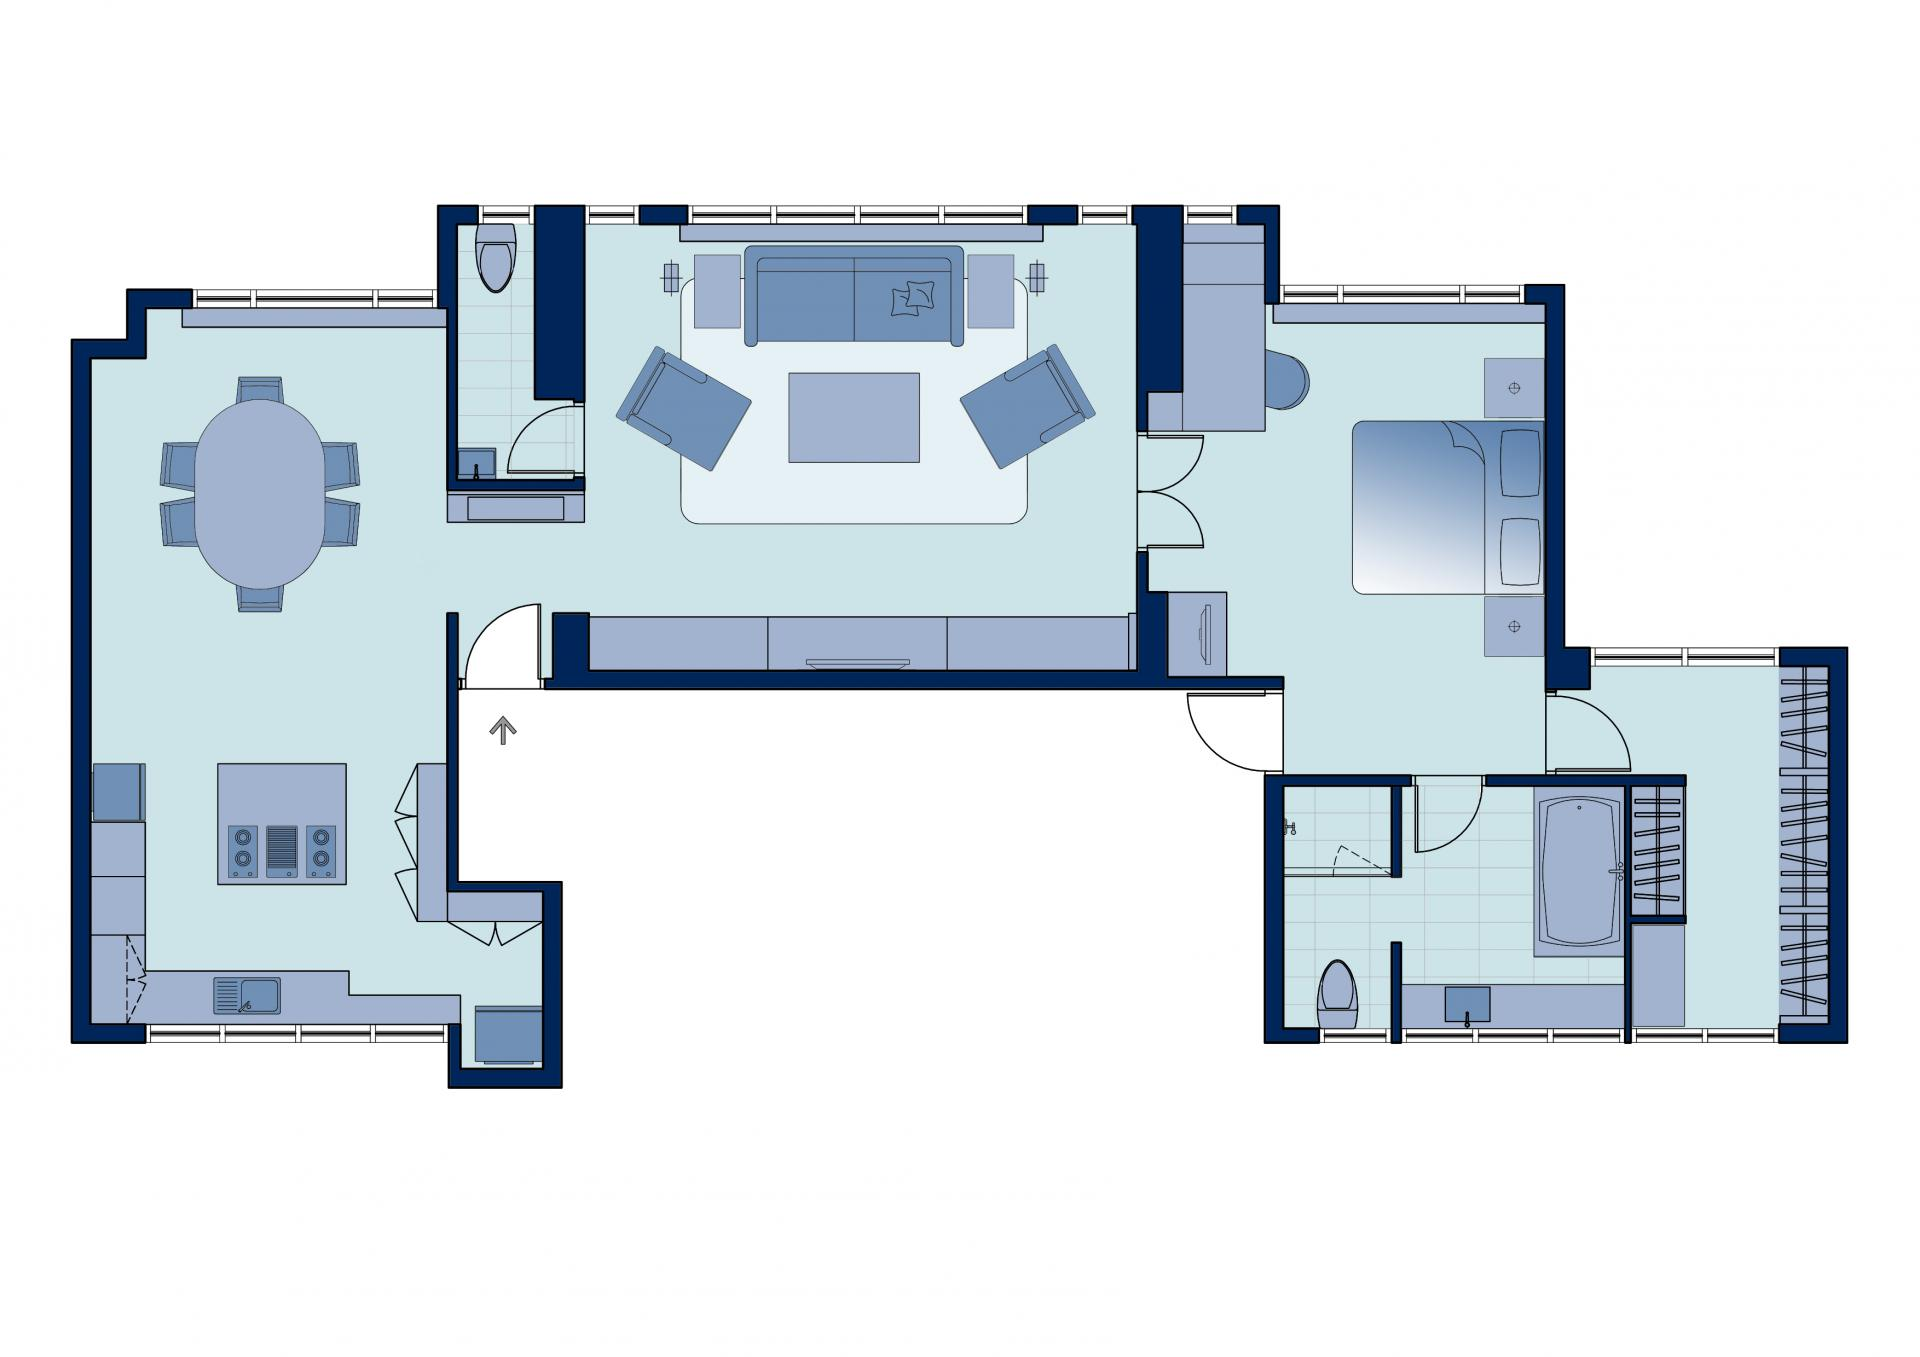 Floor plan 4 at Peel Street Central Apartments